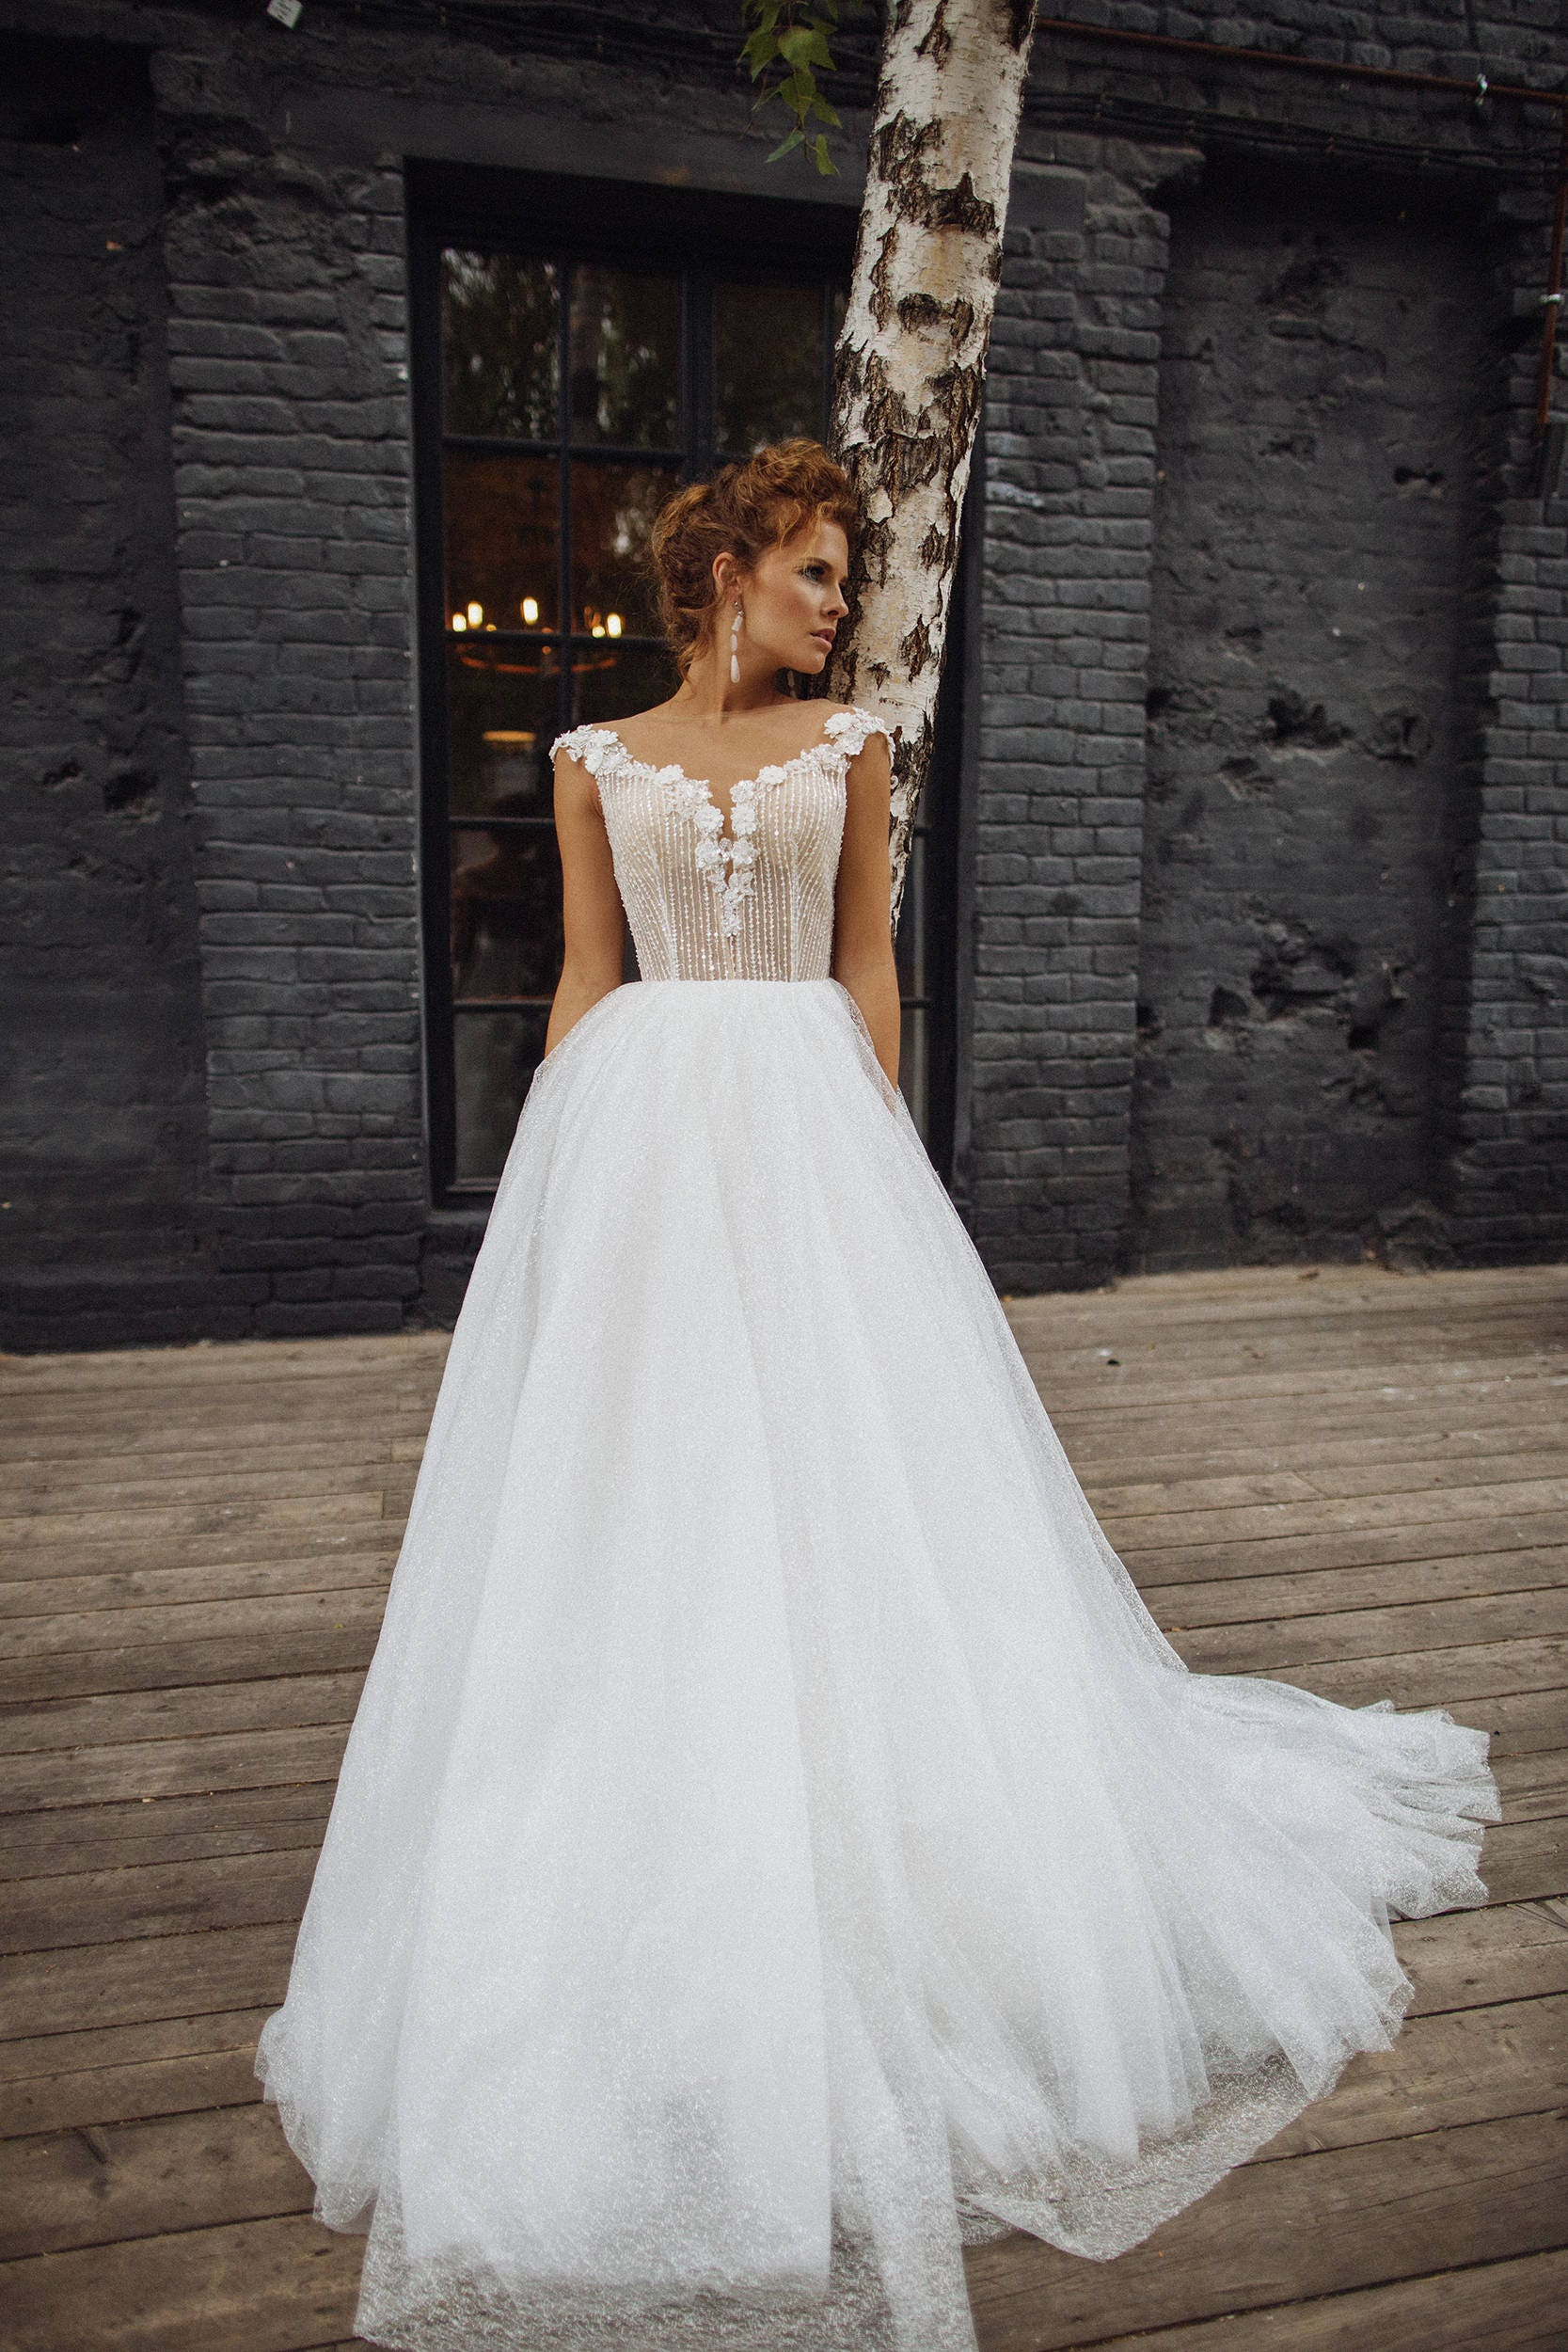 Beautiful Wedding Dresses.Wedding Dress Alisson Beautiful Wedding Dress With Shimmering Silver Light Gray Layer In Skirt